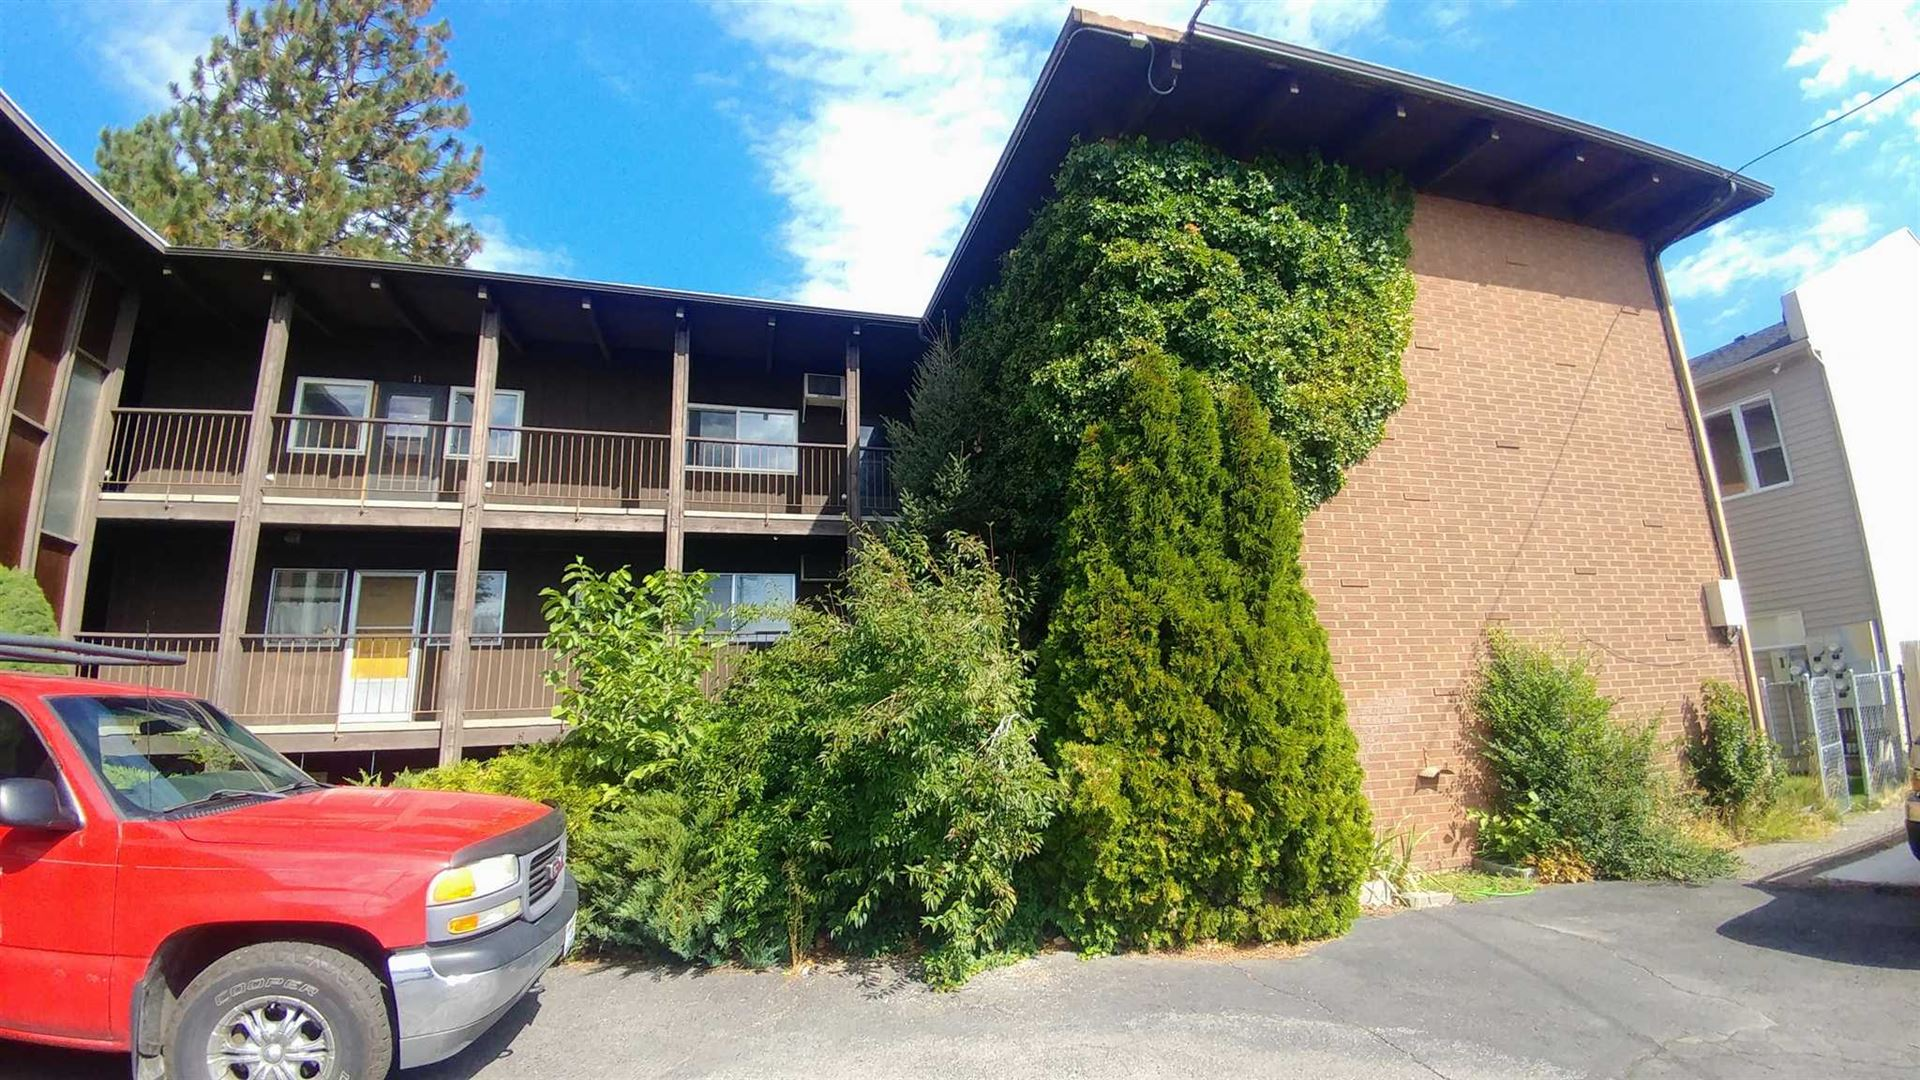 108 E Rowan Ave #11, Spokane, WA 99207 - #: 202122253